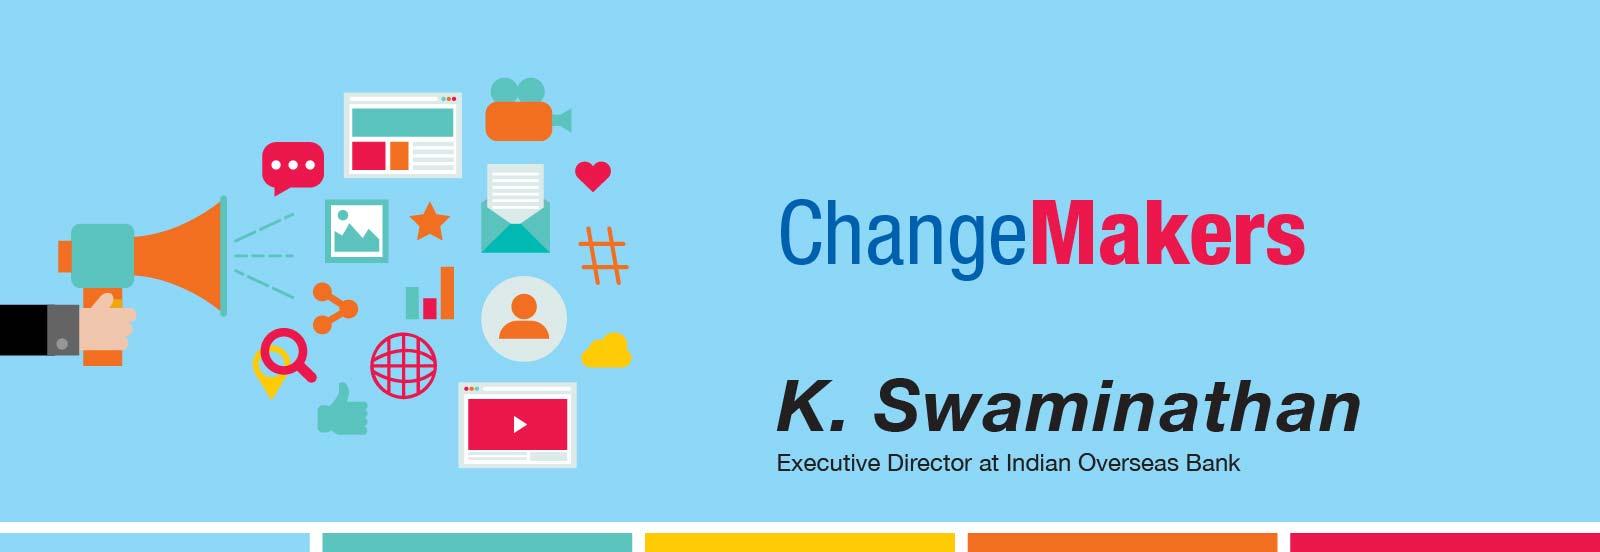 K.Swaminathan